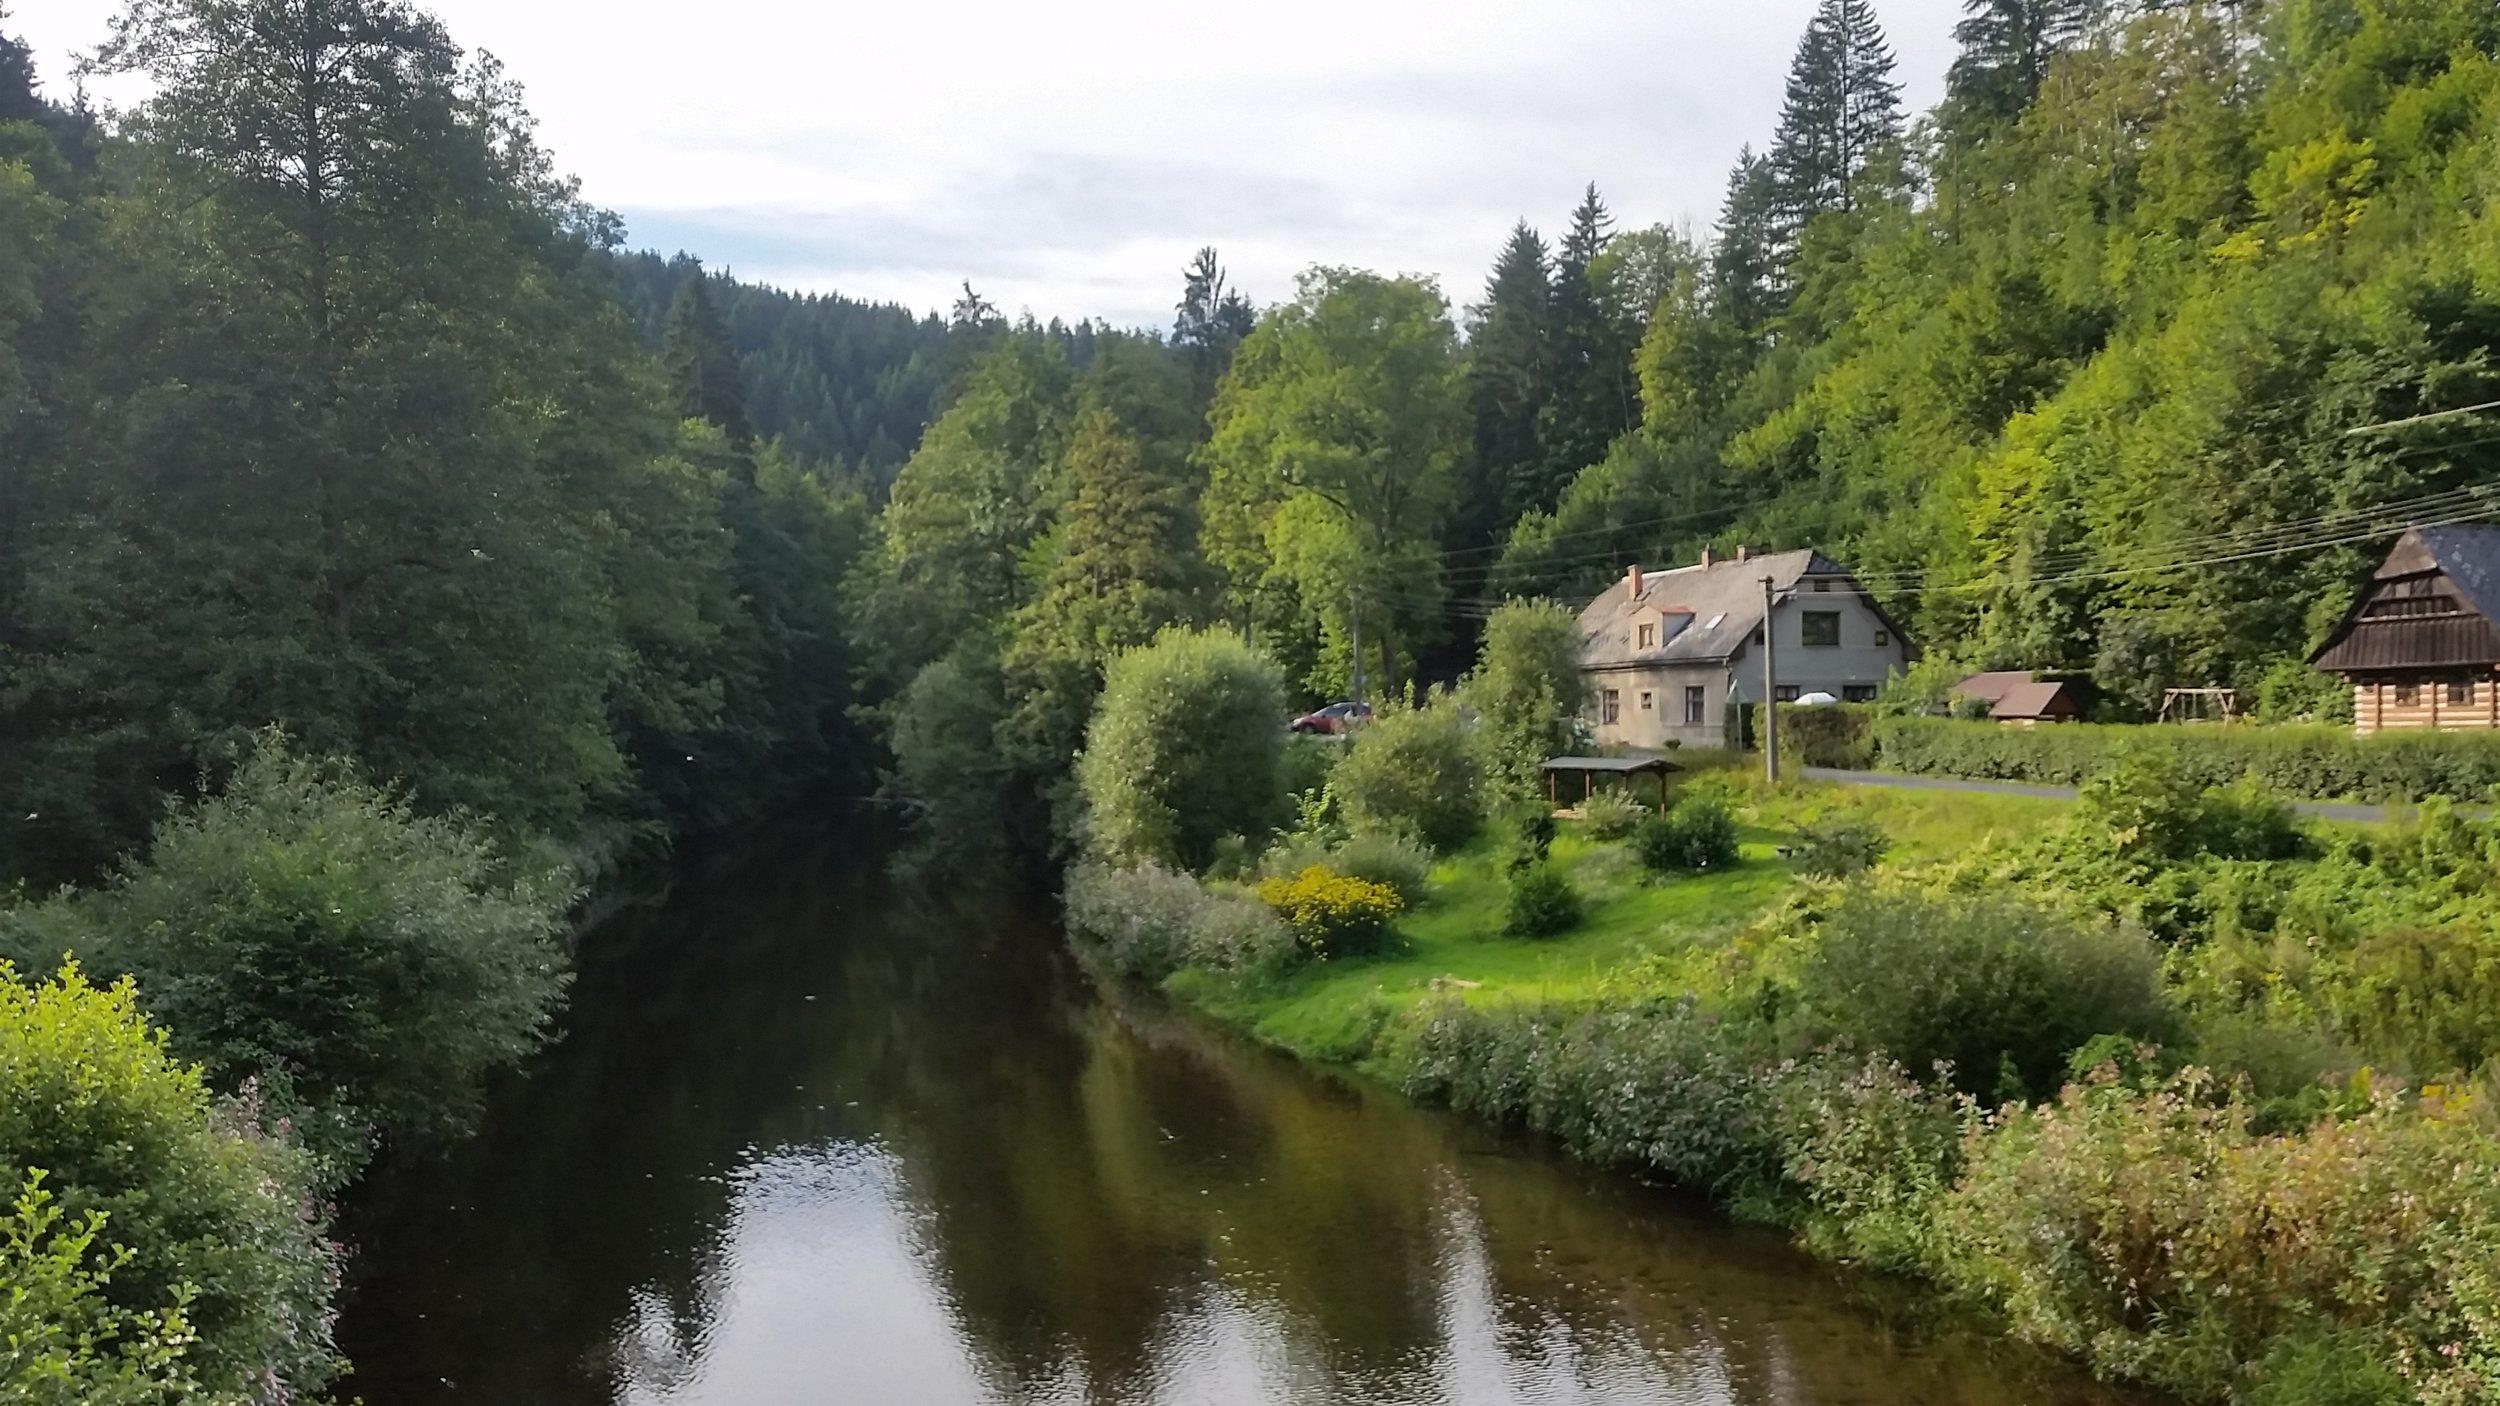 The town of Jesseny, Czech Republic